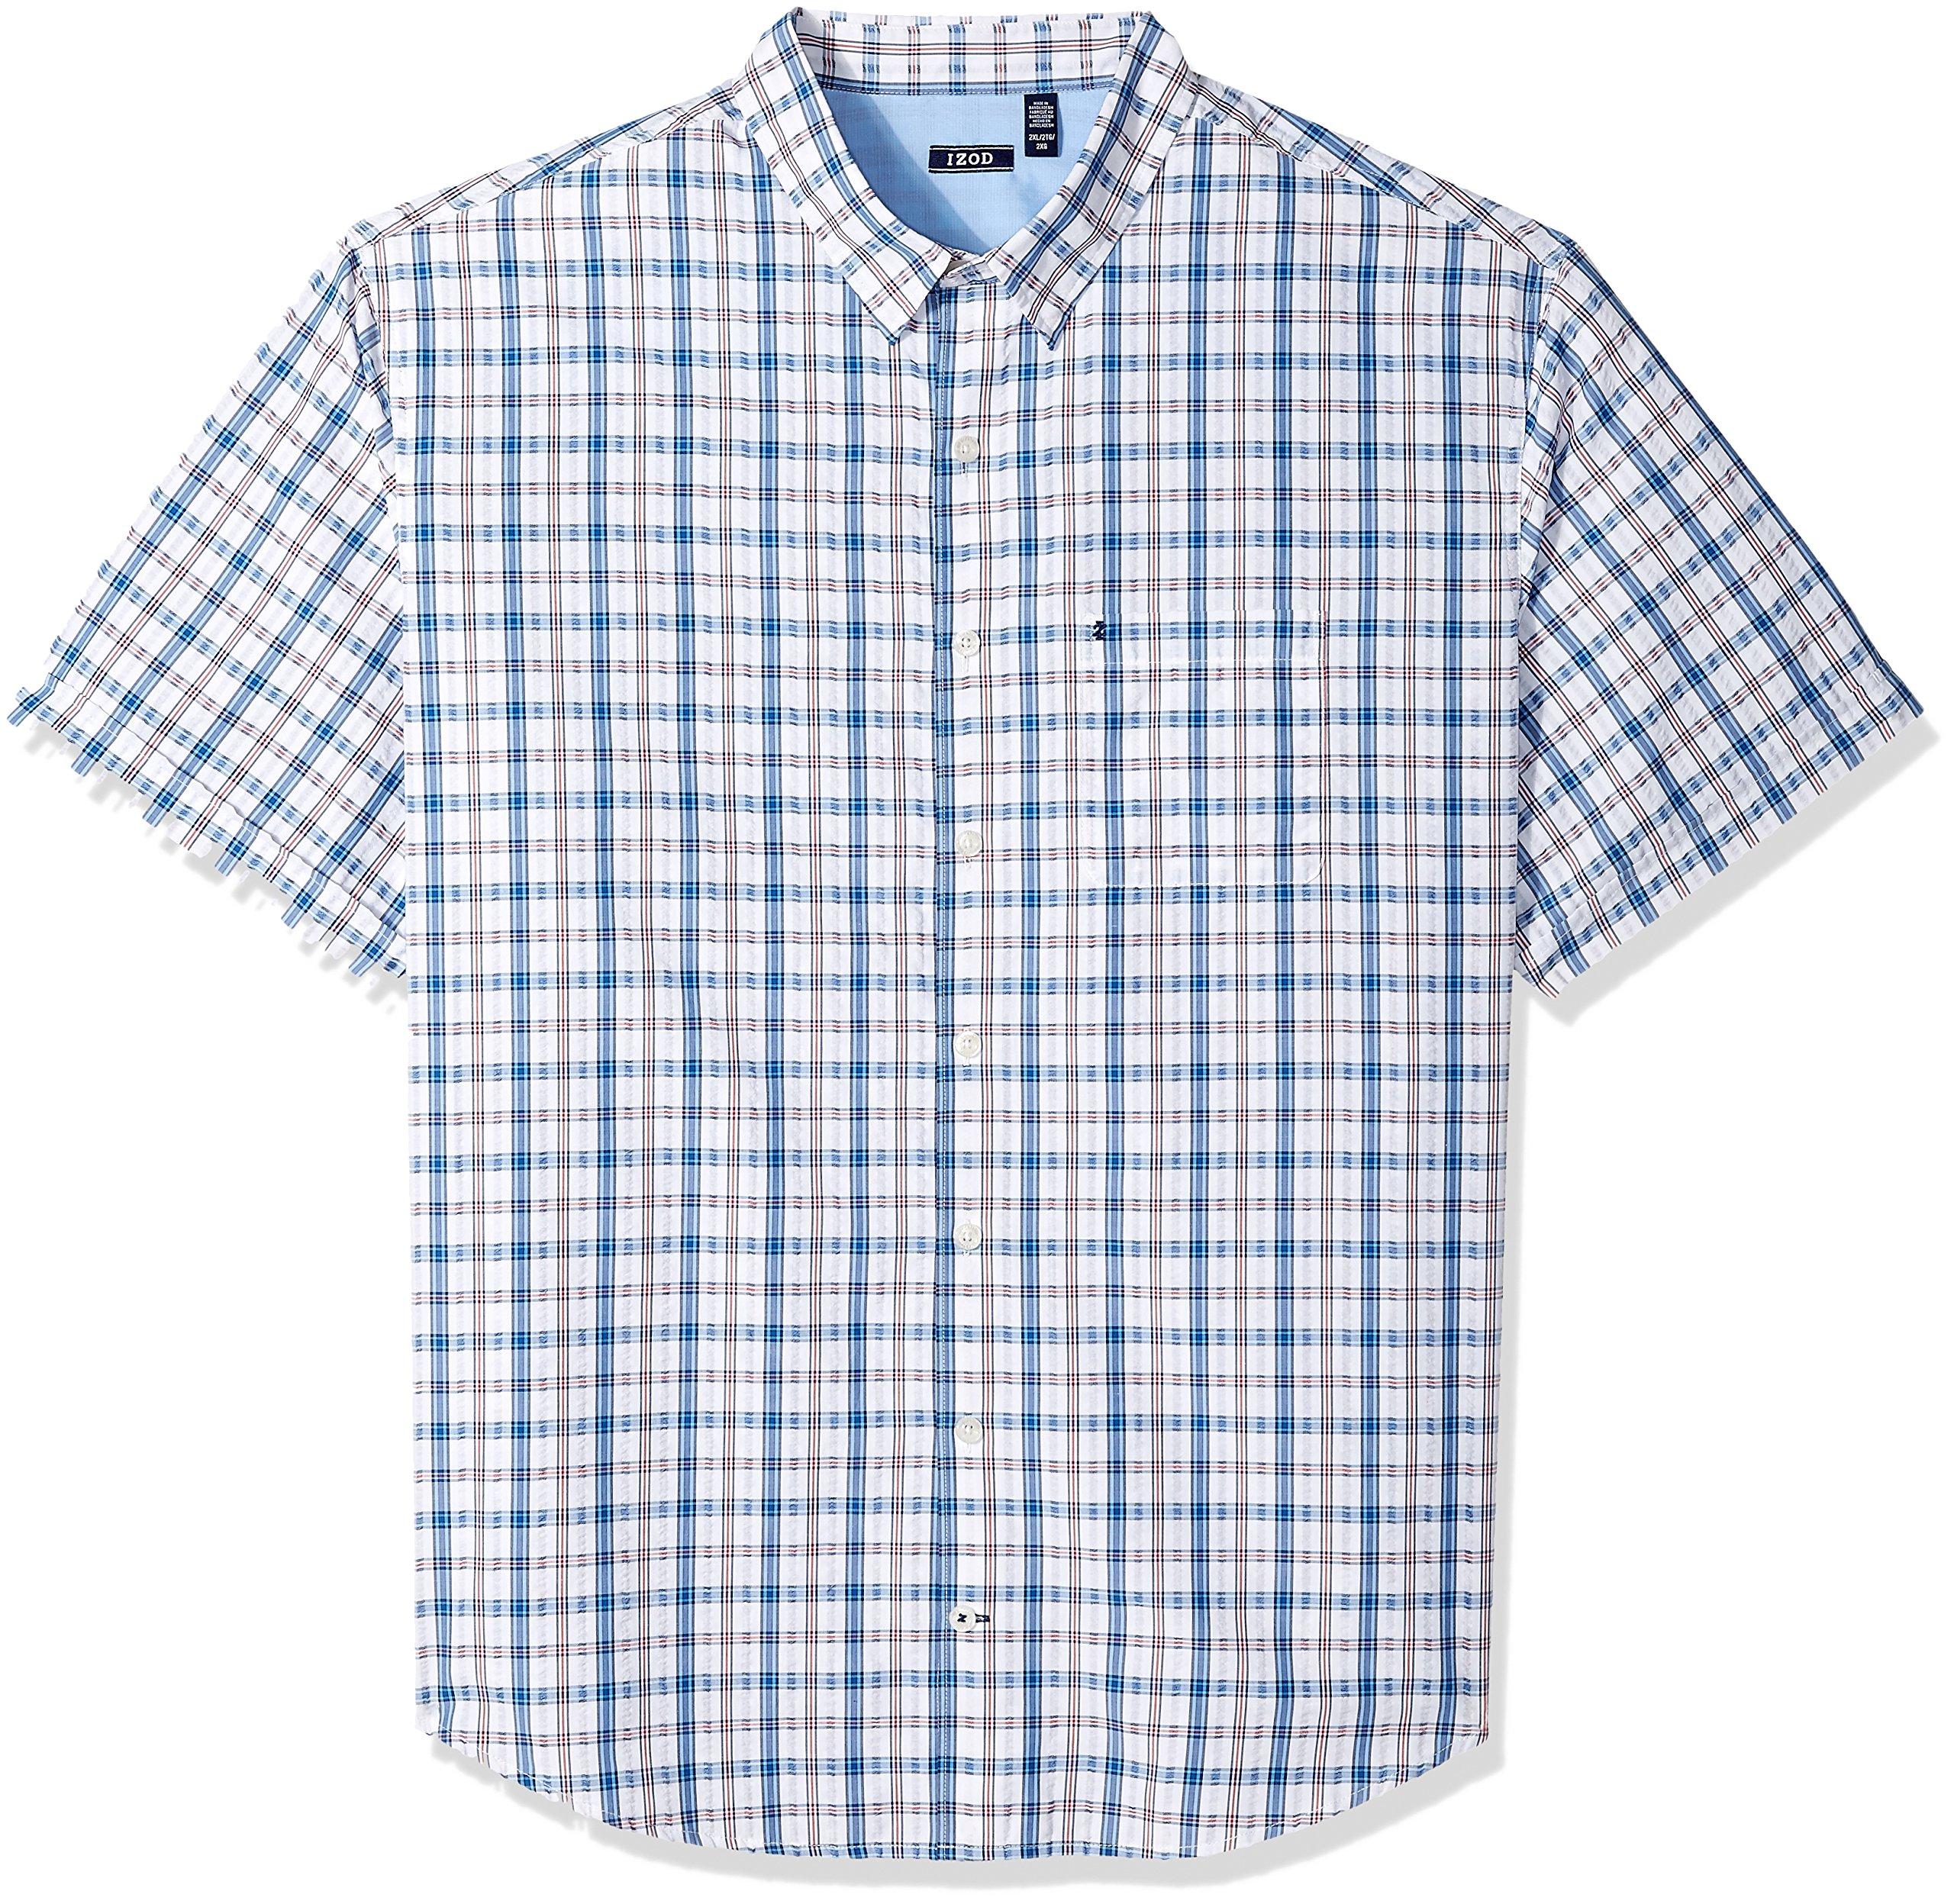 IZOD Men's Tall Short Sleeve Plaid Seersucker Shirt, Bright White, 3X-Large Big